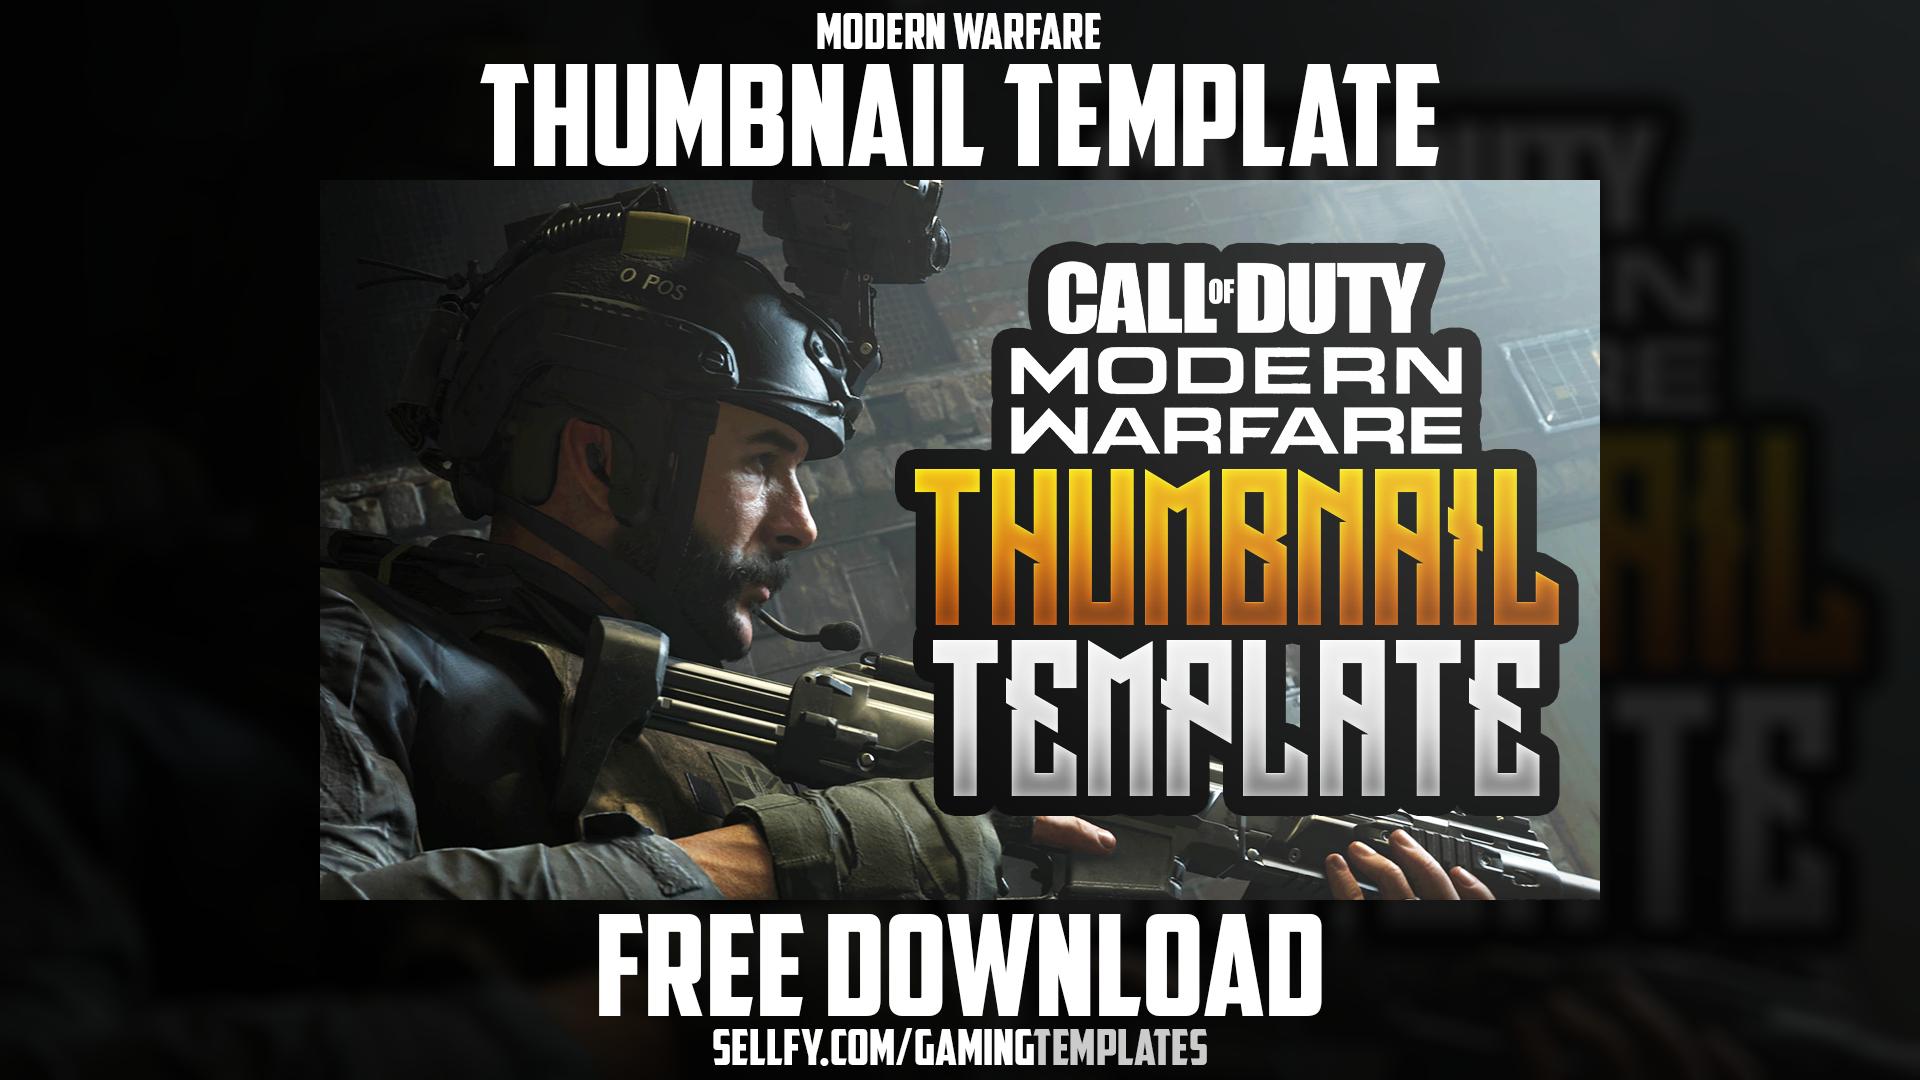 Modern Warfare Free Youtube Thumbnail Template Photoshop Template In 2020 Modern Warfare Warfare Photoshop Template